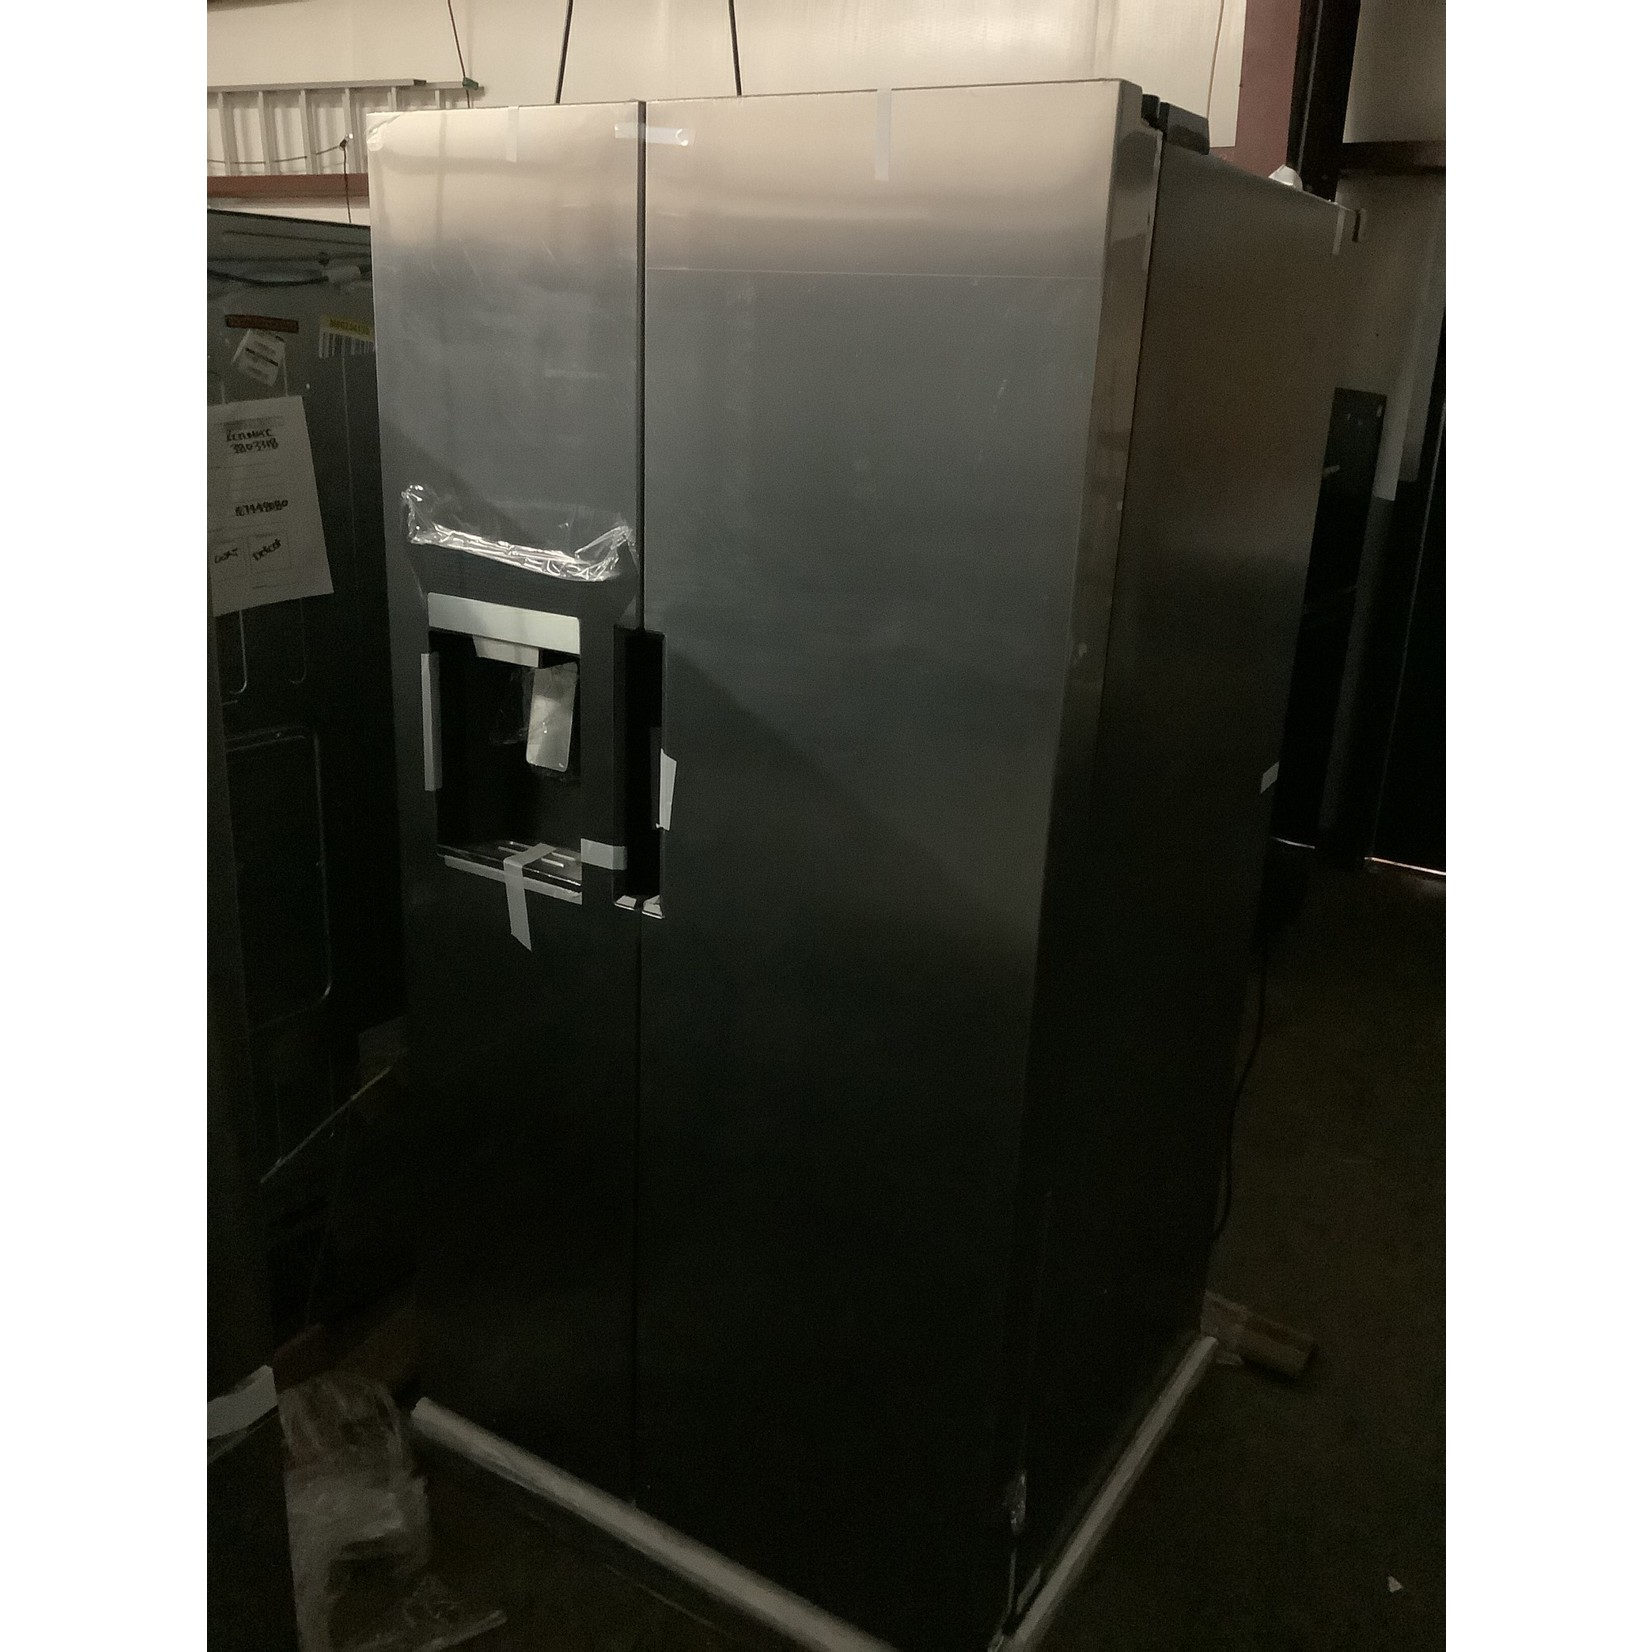 MIDEA Midea refrigerator